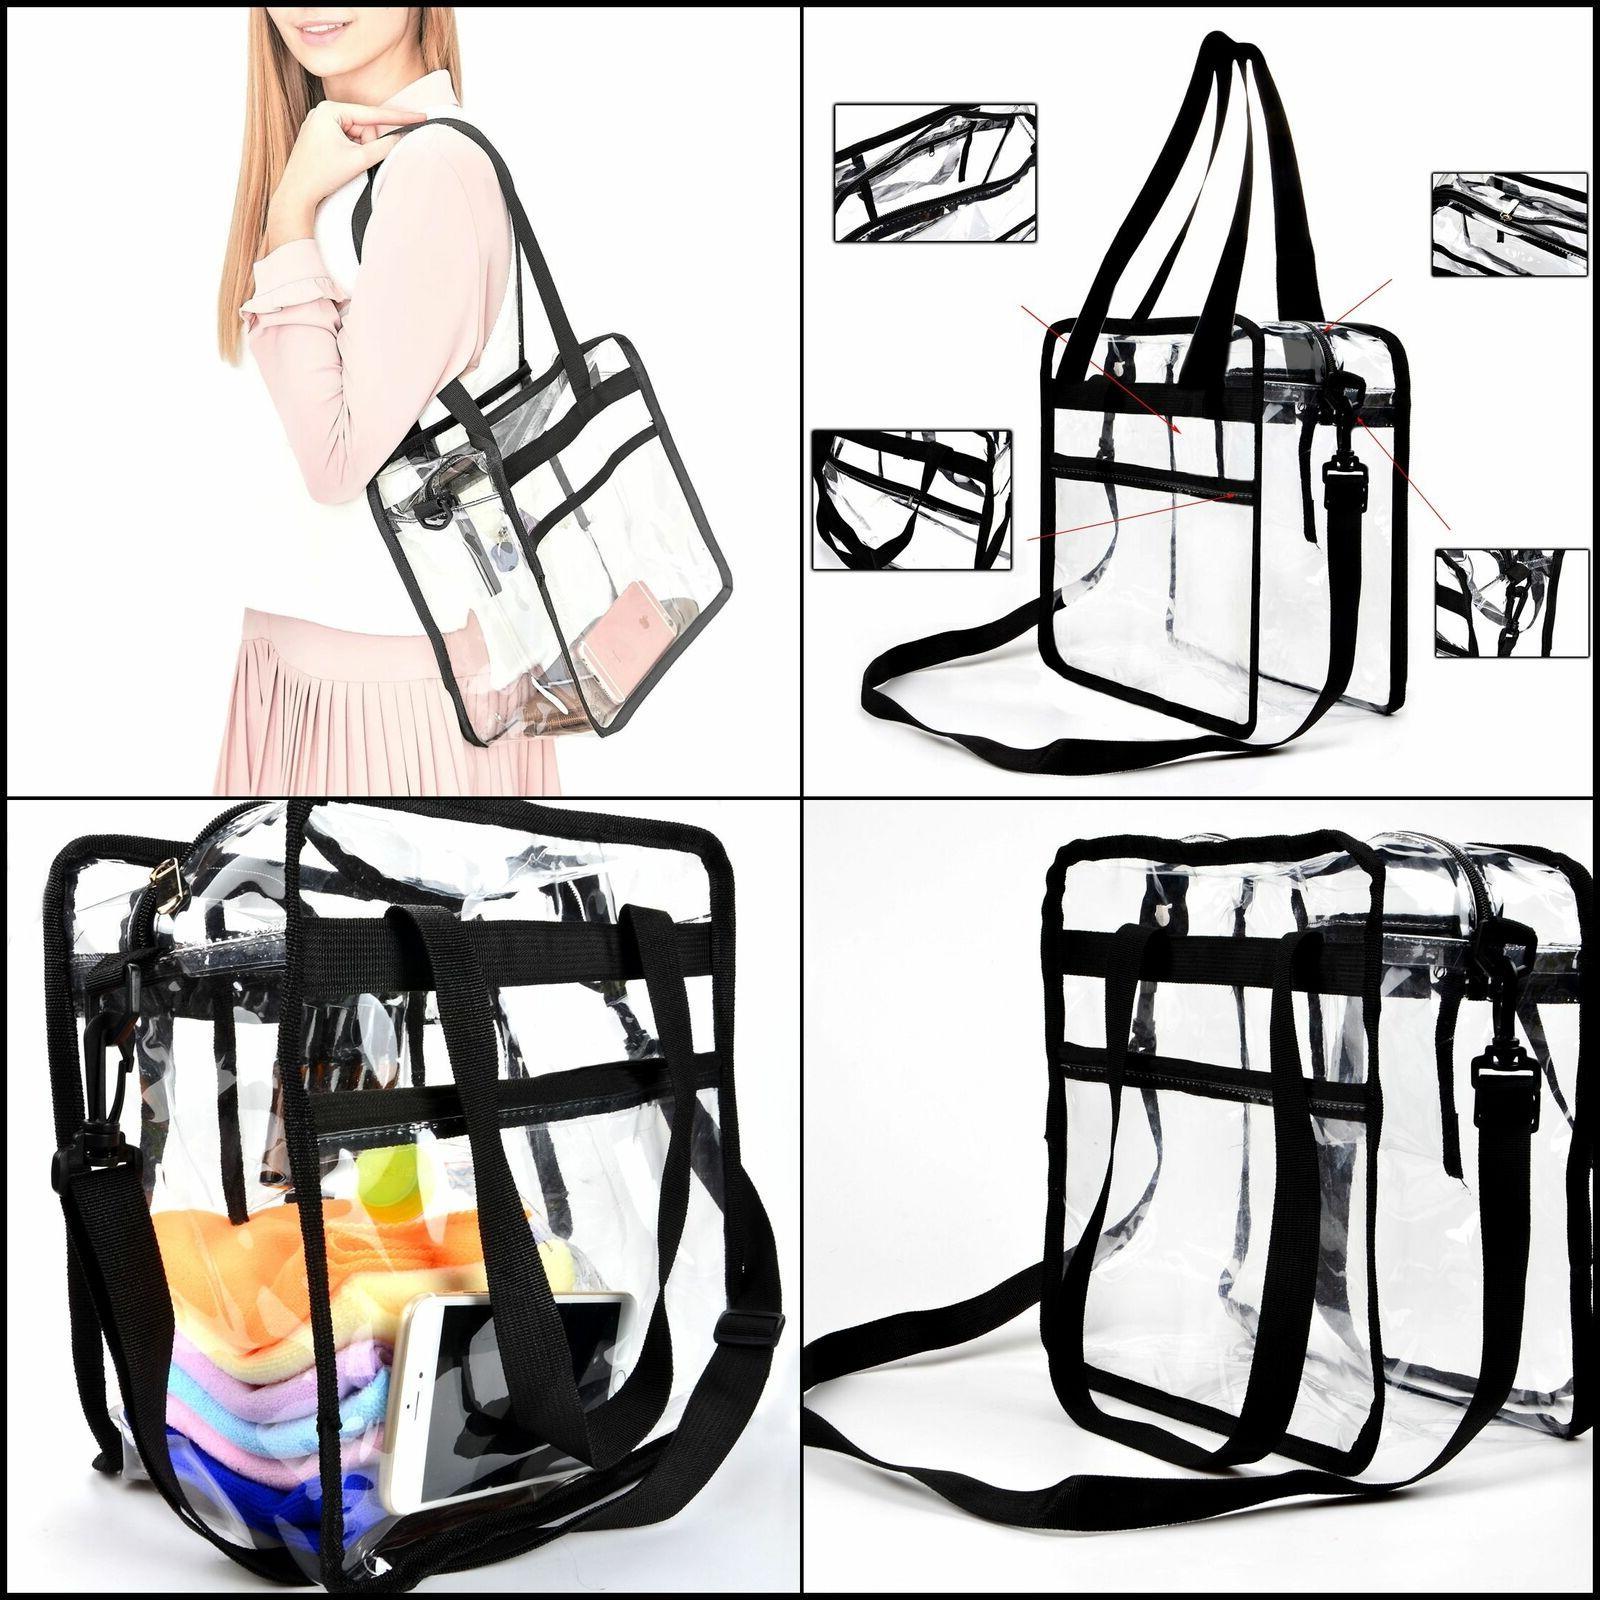 Clear Heavy Duty Plastic Tote Bag For Lunch School Work Gym